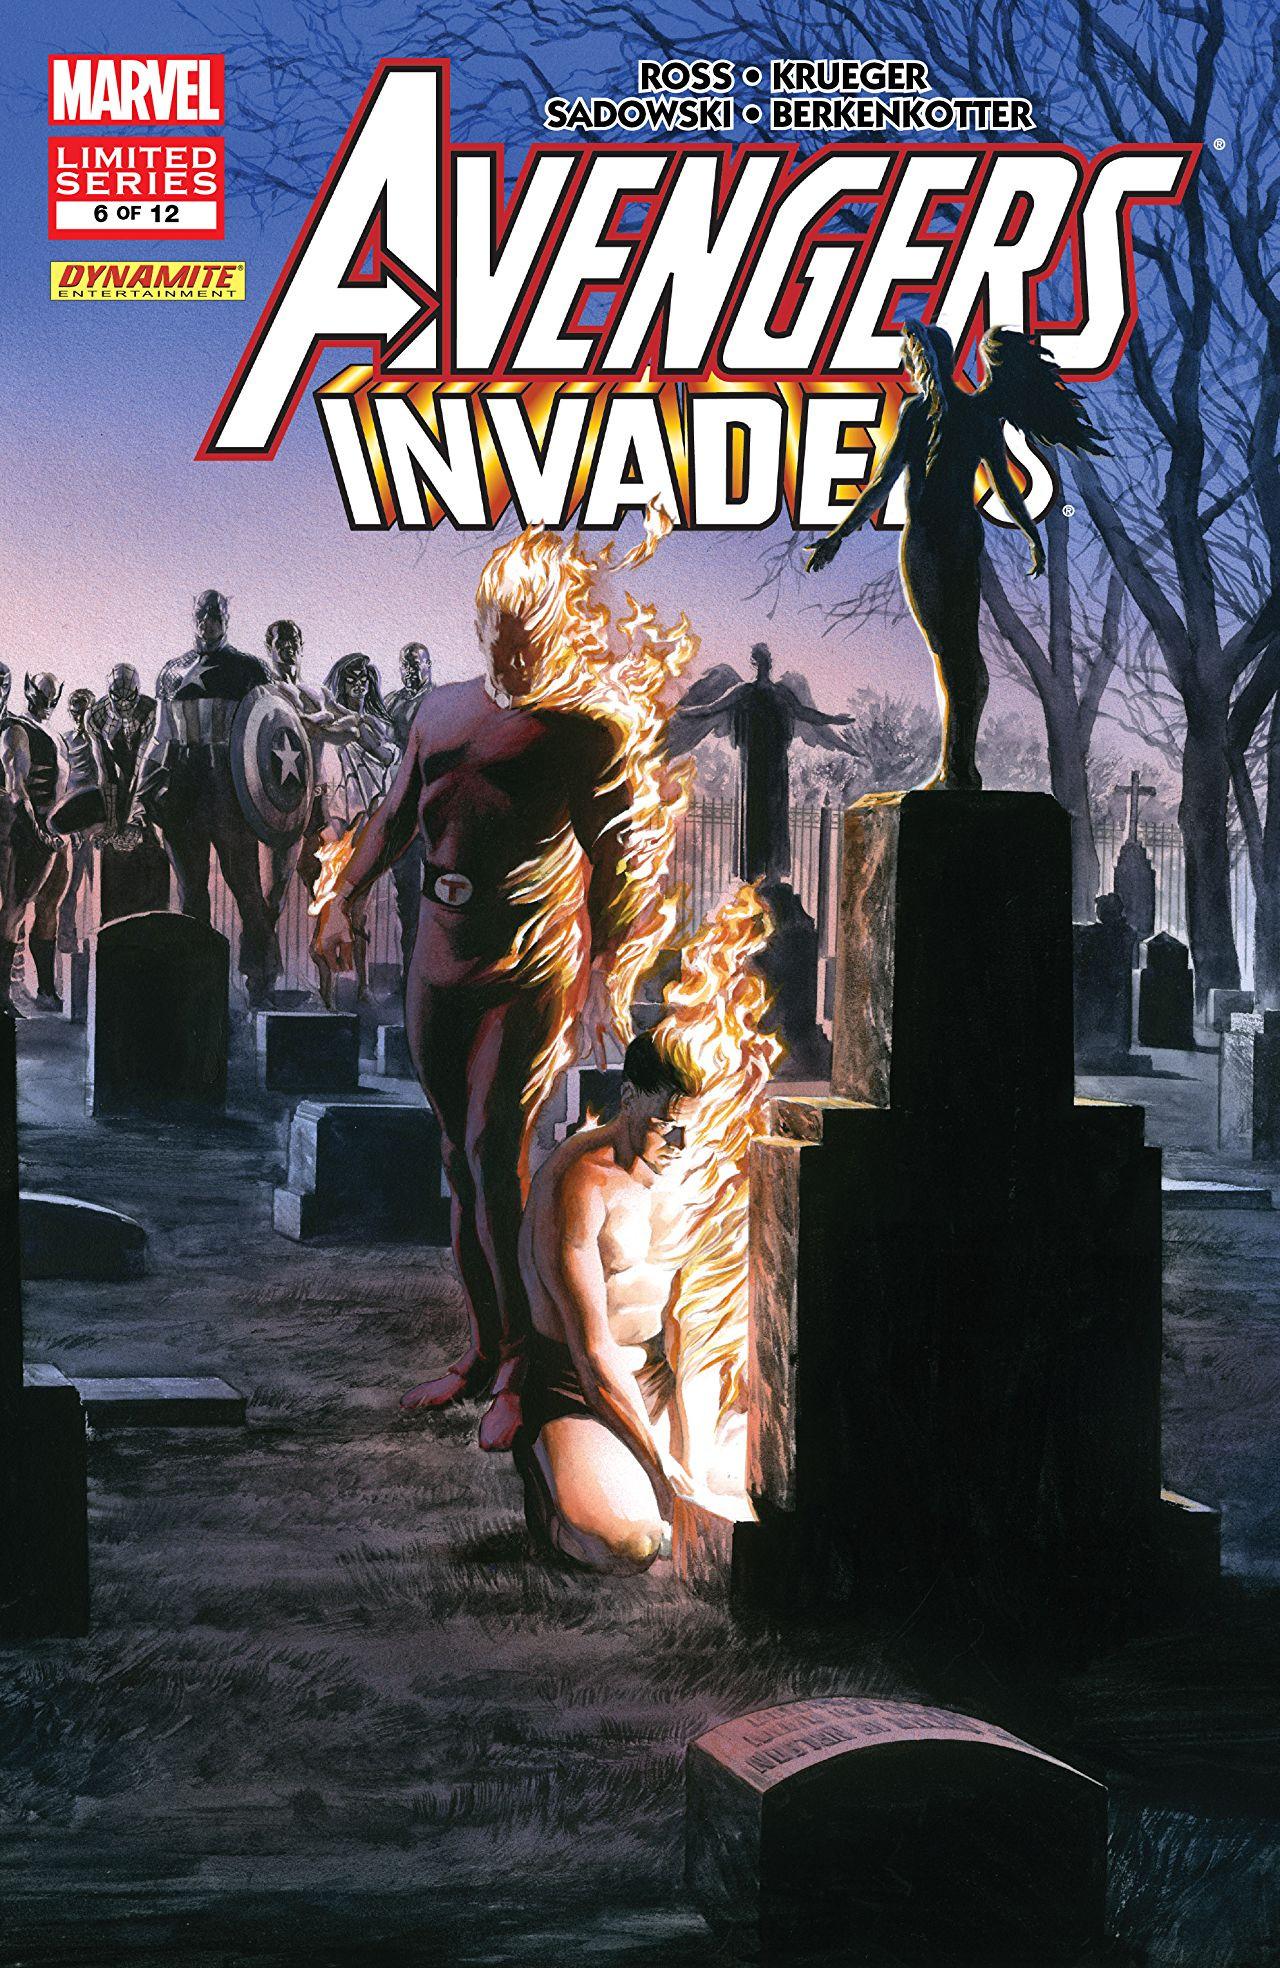 Avengers Invaders Vol 1 6